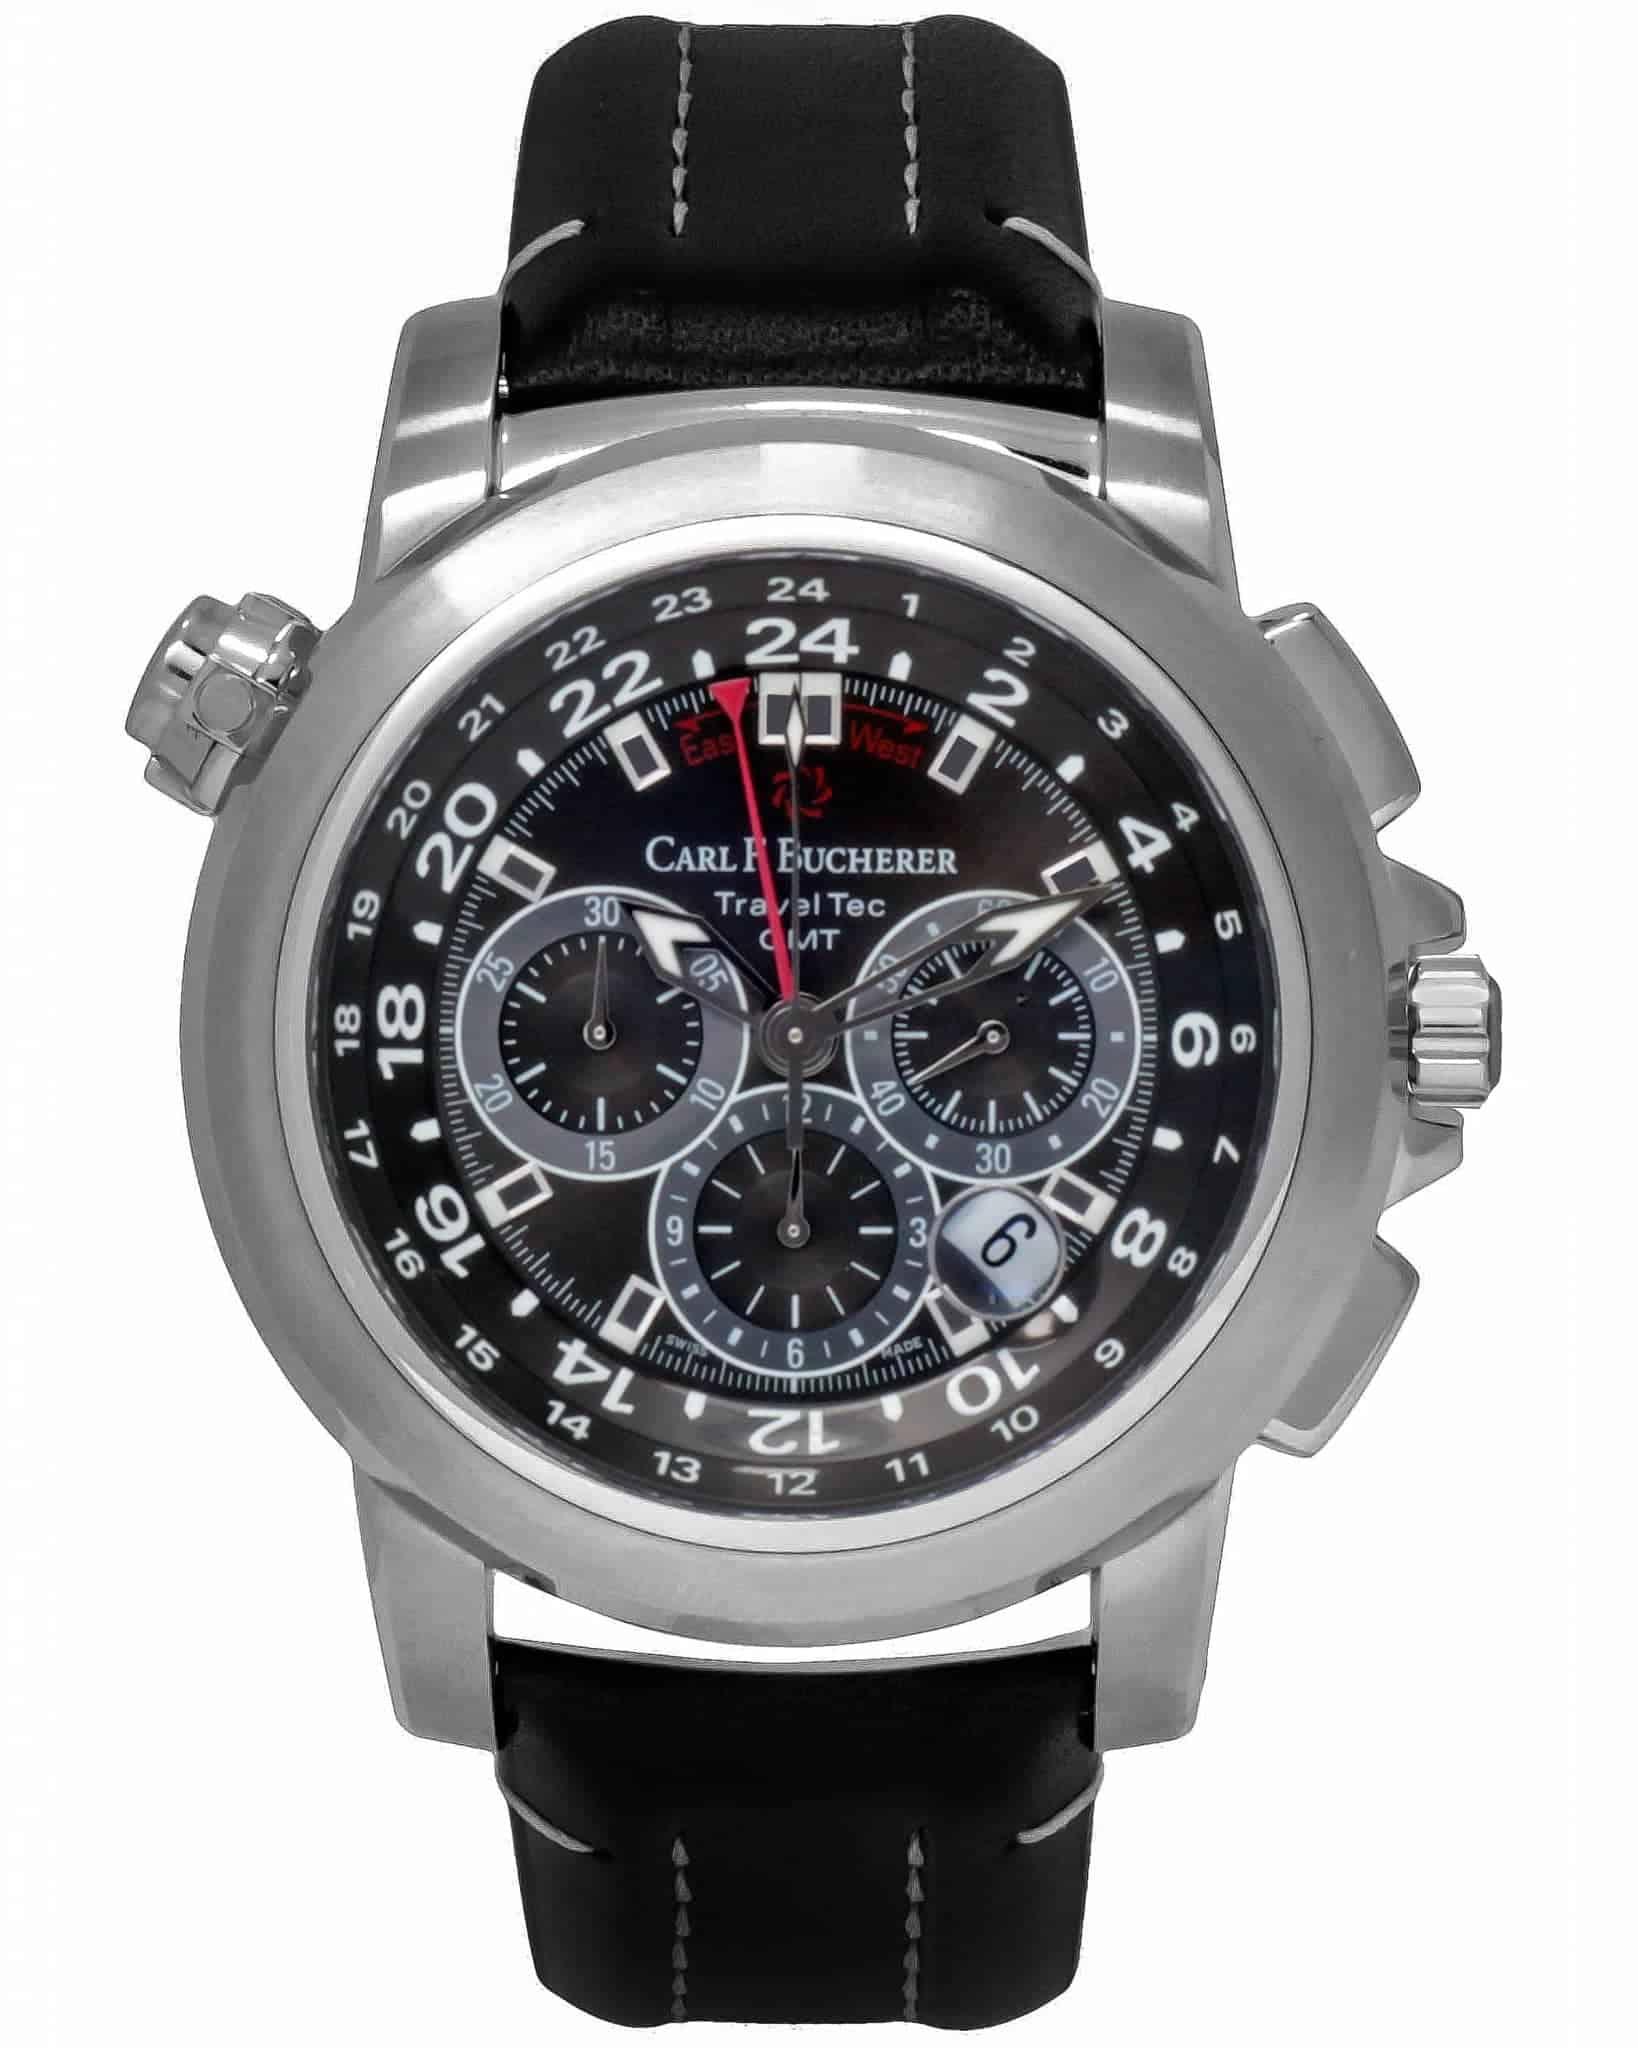 Carl F. Bucherer Patravi TravelTec Chronograph Timezone Men's Watch – 00.10620.08.33.01